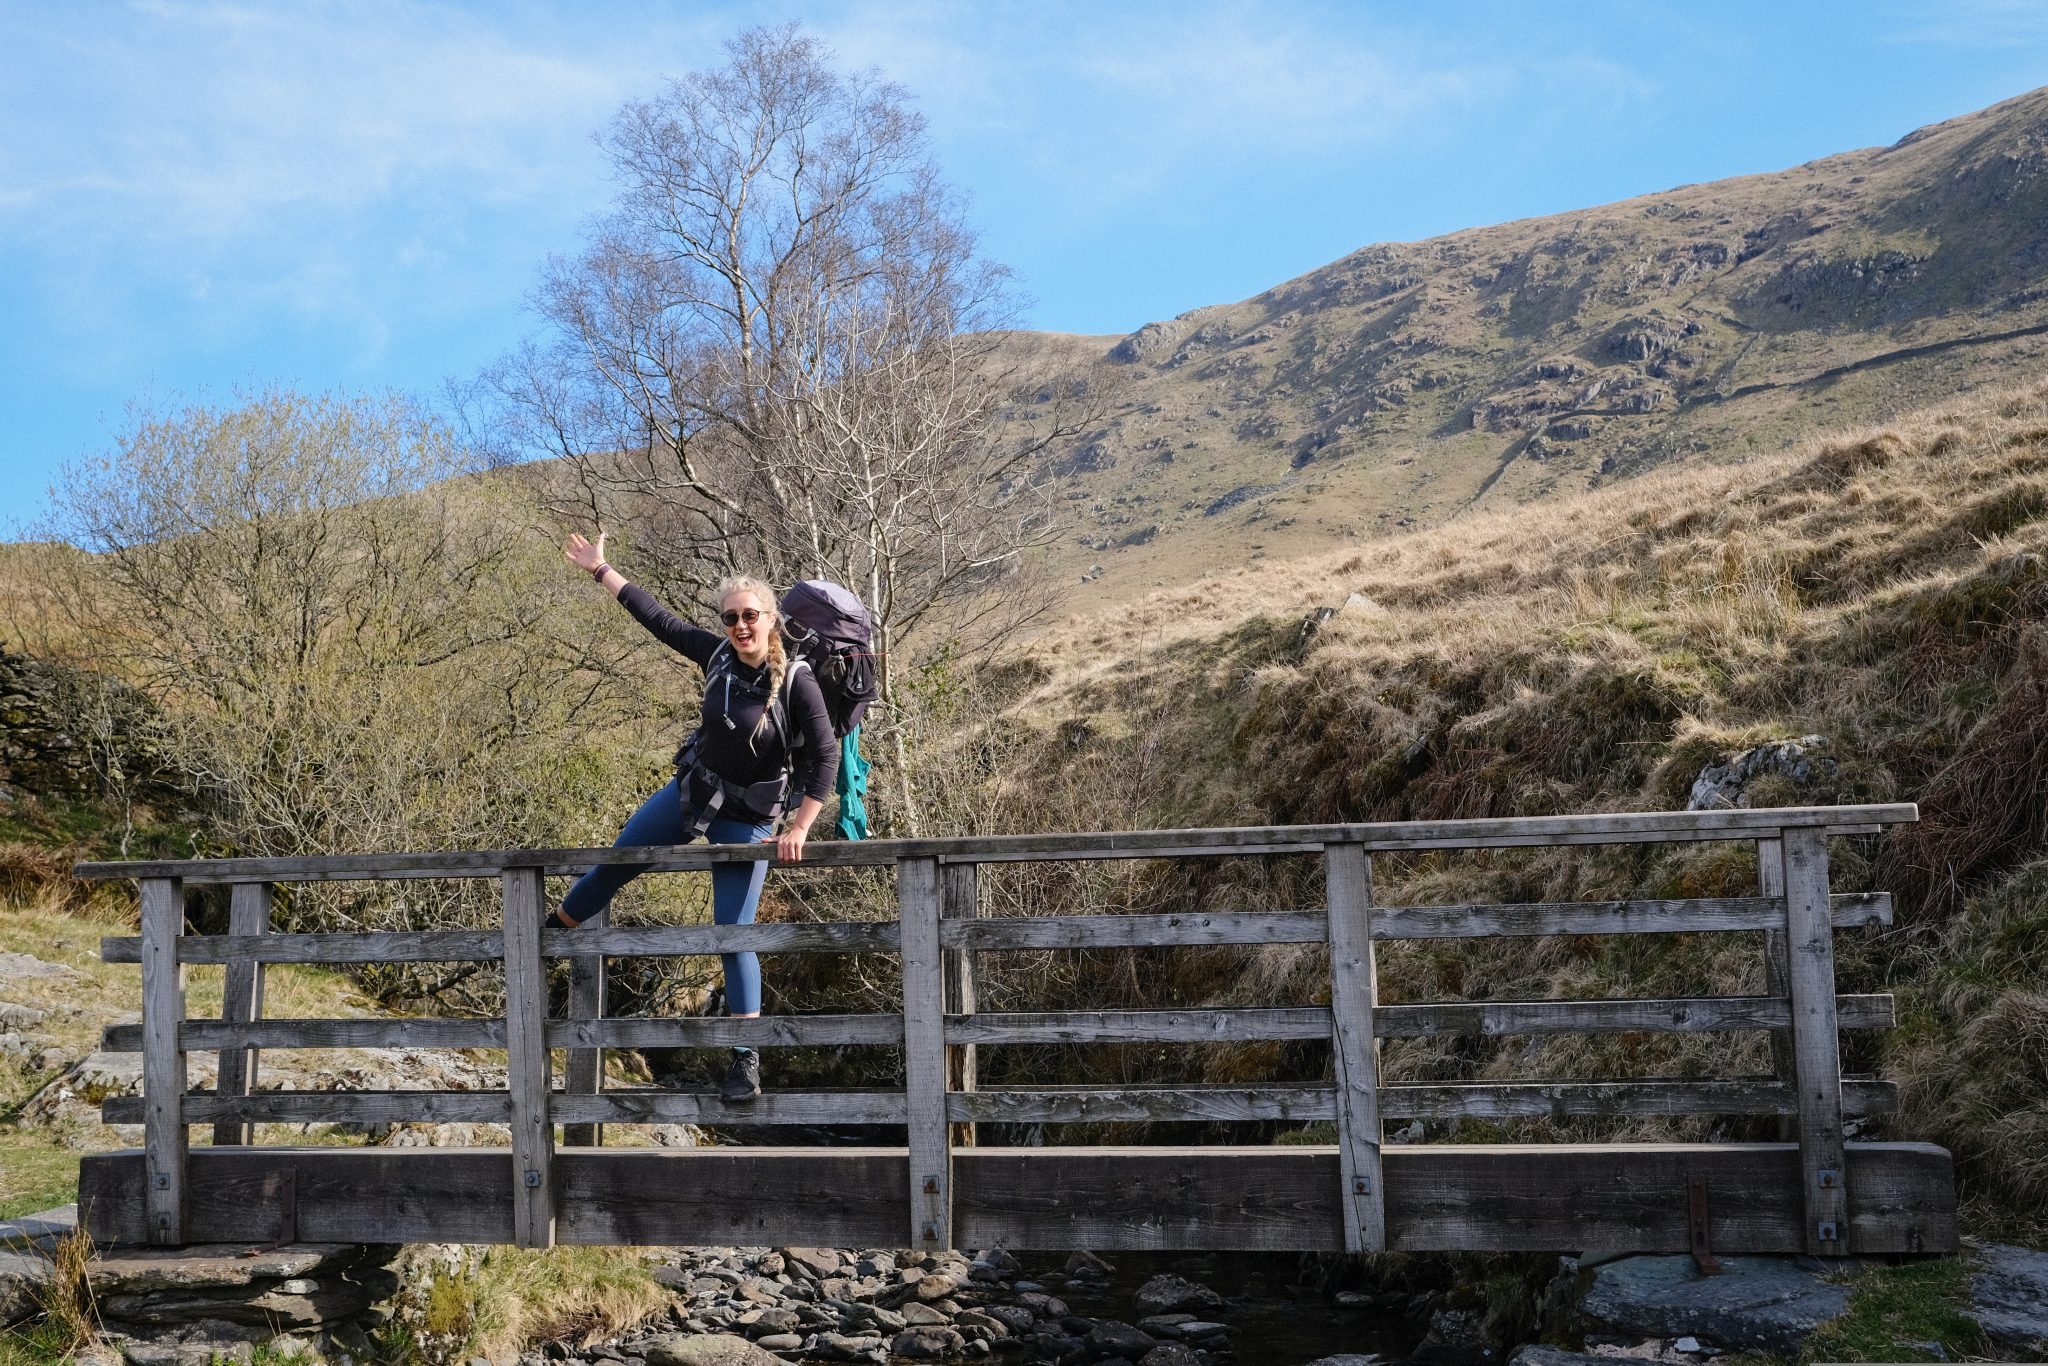 Girl hiking along a bridge